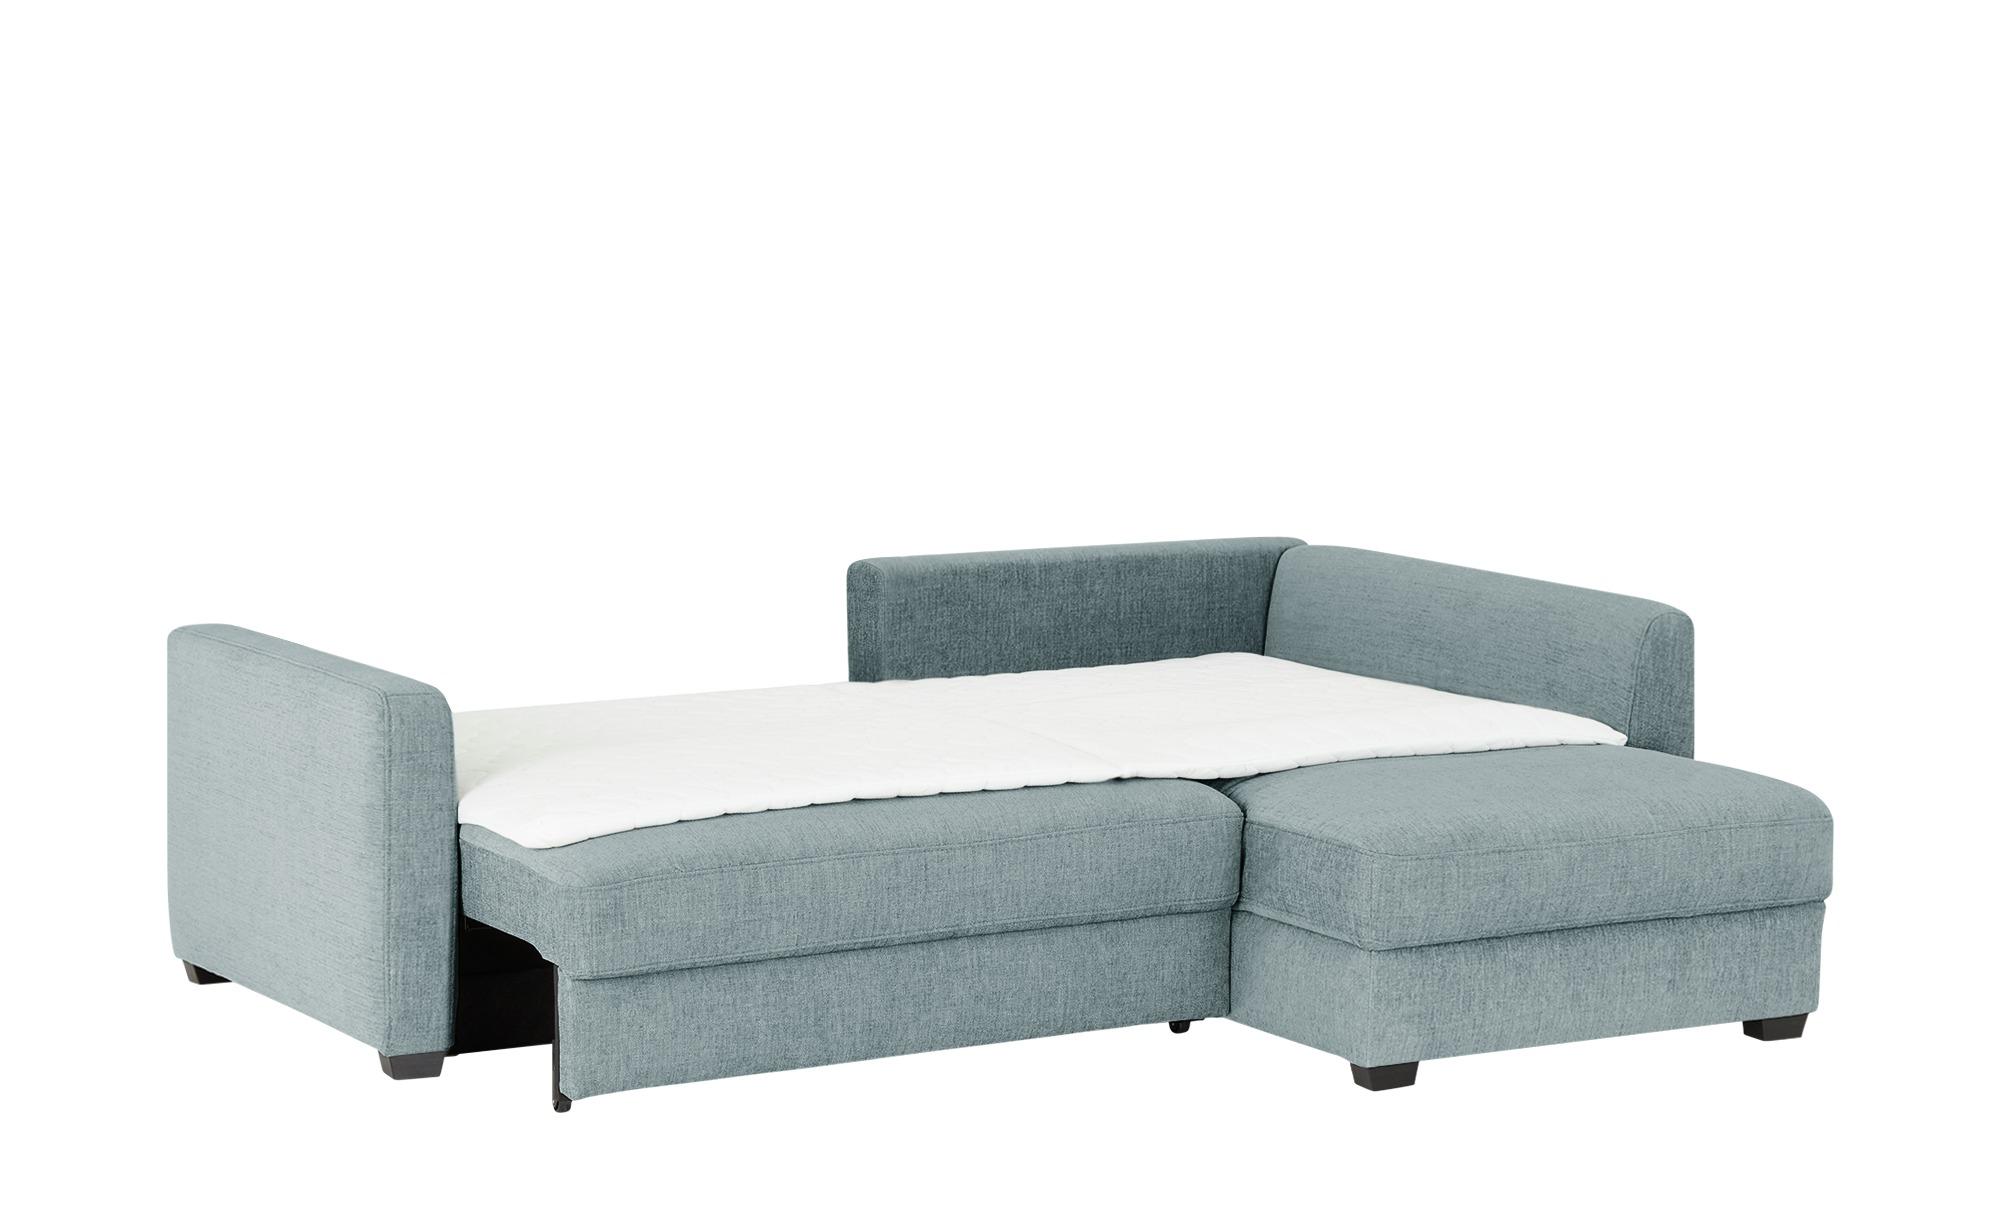 bobb   Lisa de Luxe ¦ blau ¦ Maße (cm): H: 90 Polstermöbel > Sofas > Ecksofas - Höffner